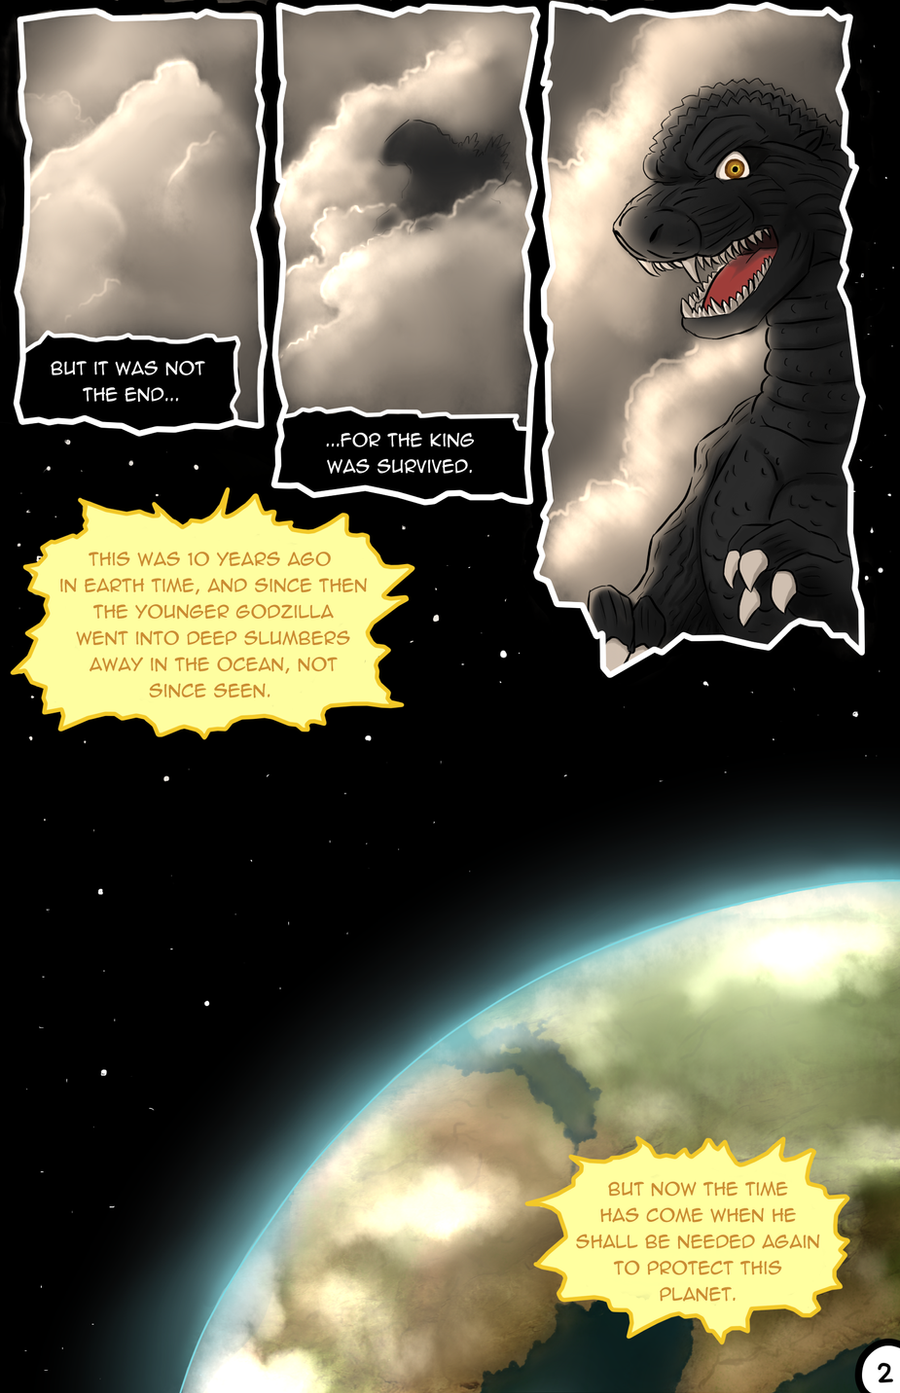 Godzilla Triumphant (2.0) - Page 2 by kaijukid